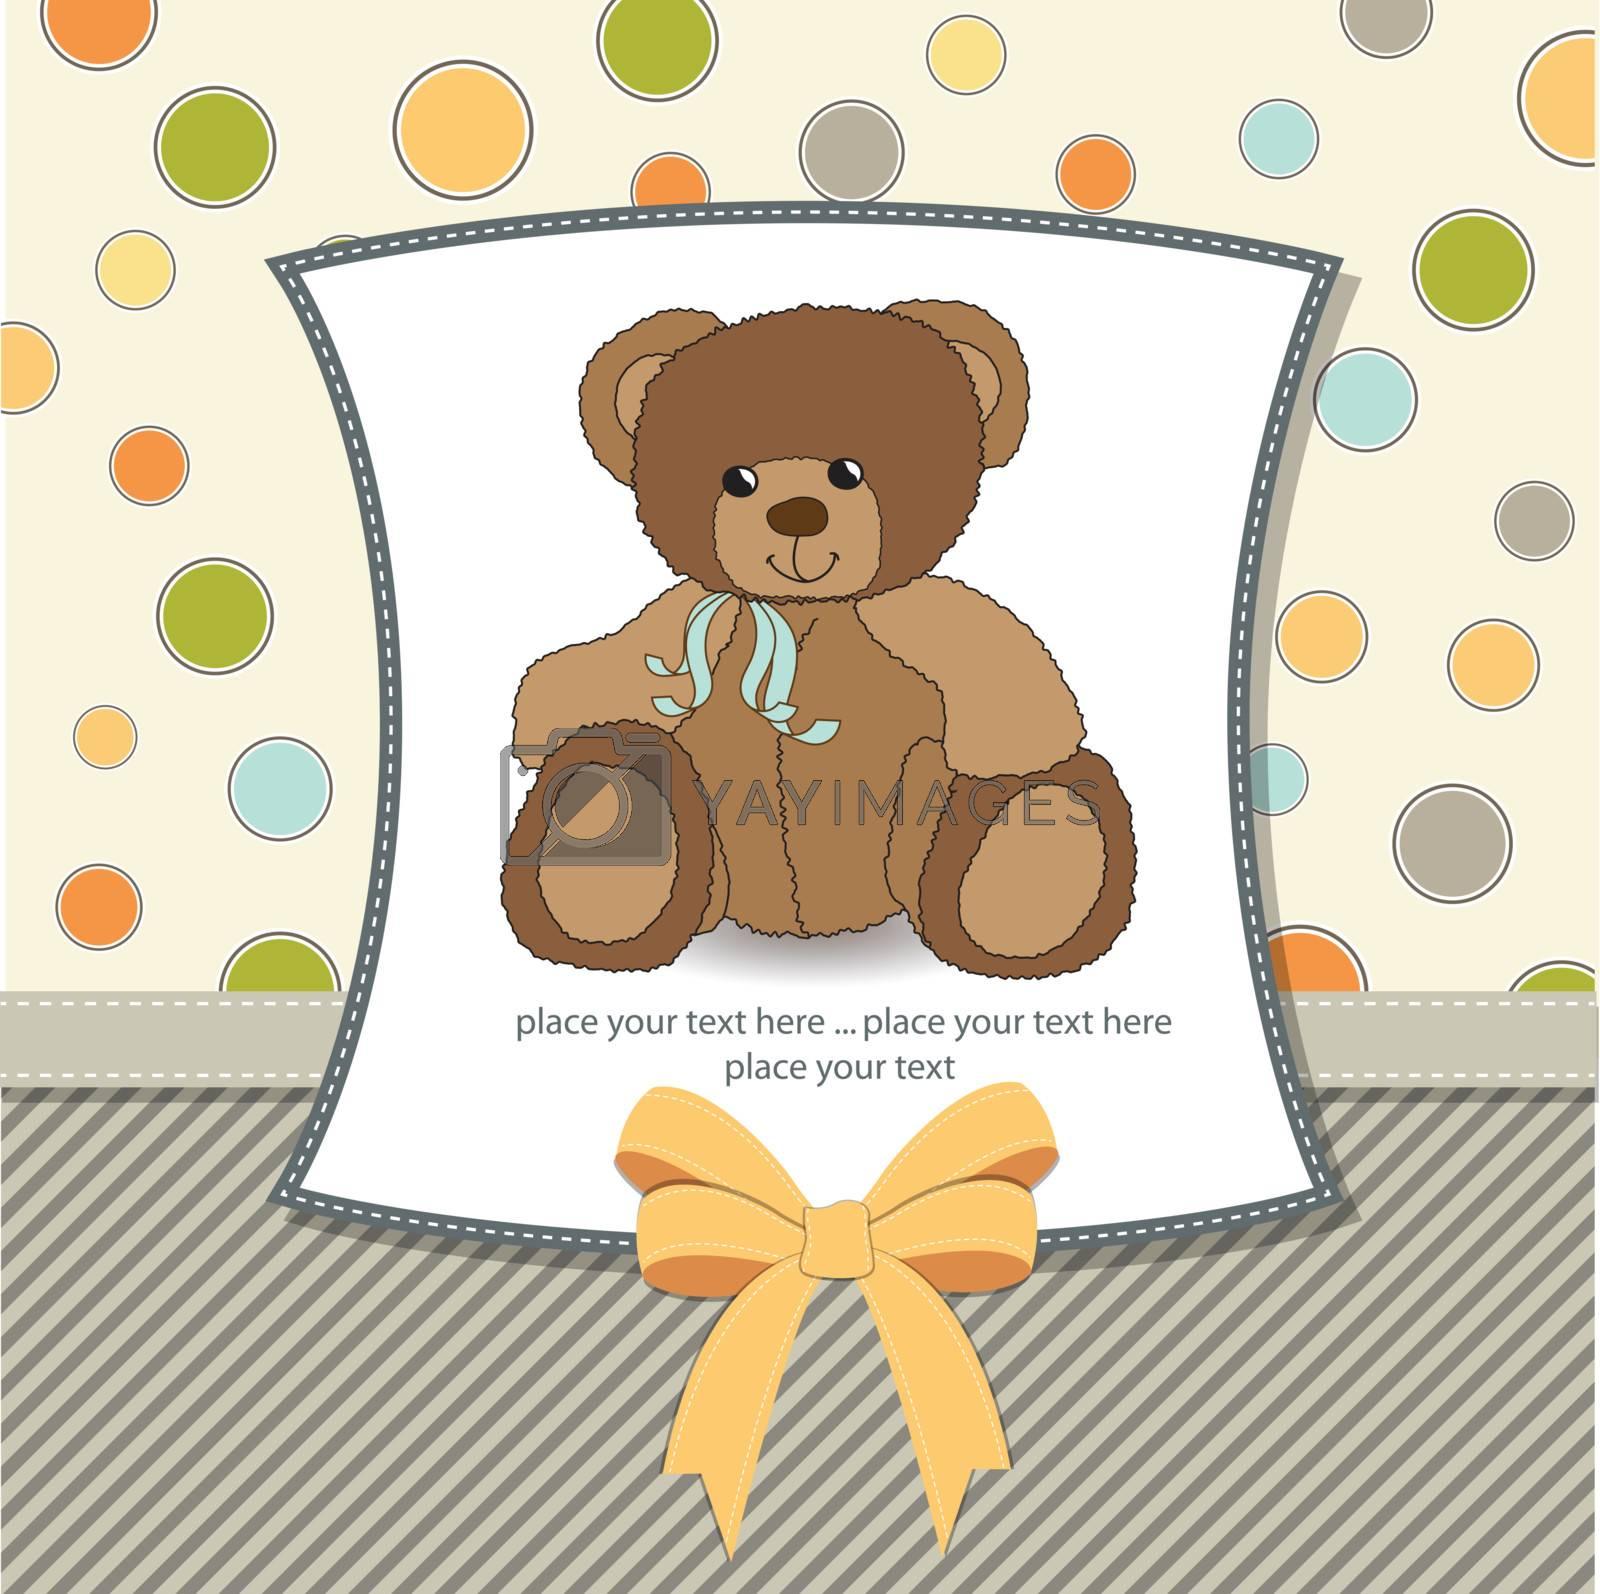 customizable greeting card with teddy bear